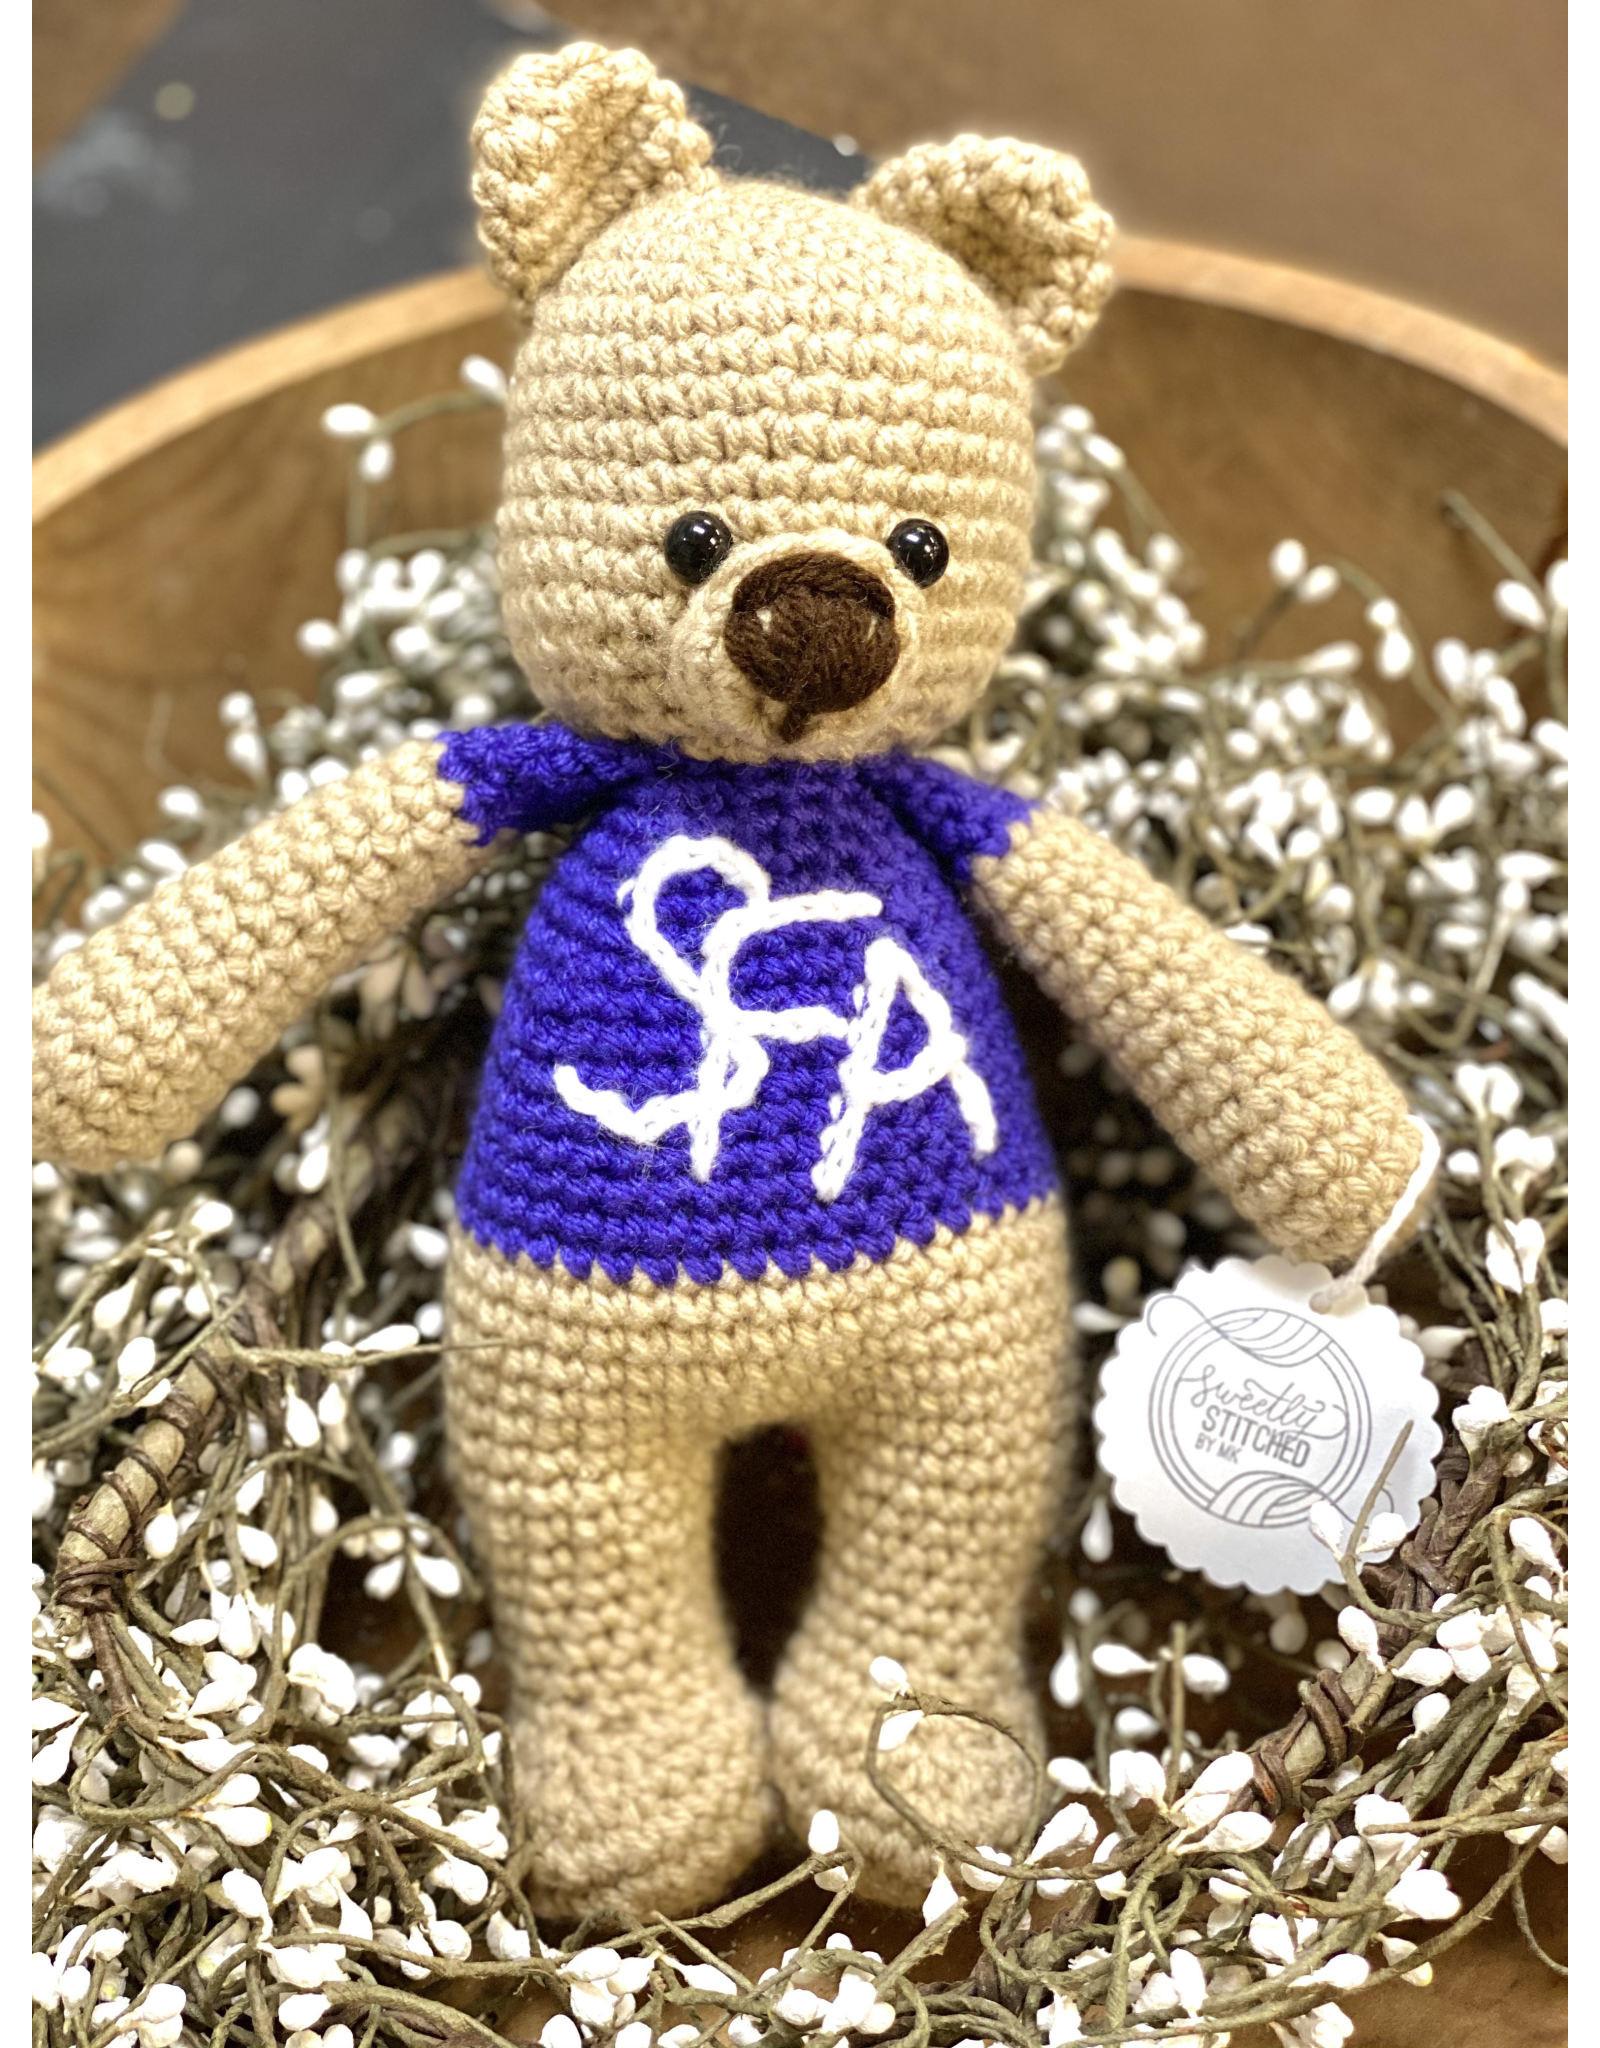 Sweetly Stitched Lumberjack Bear